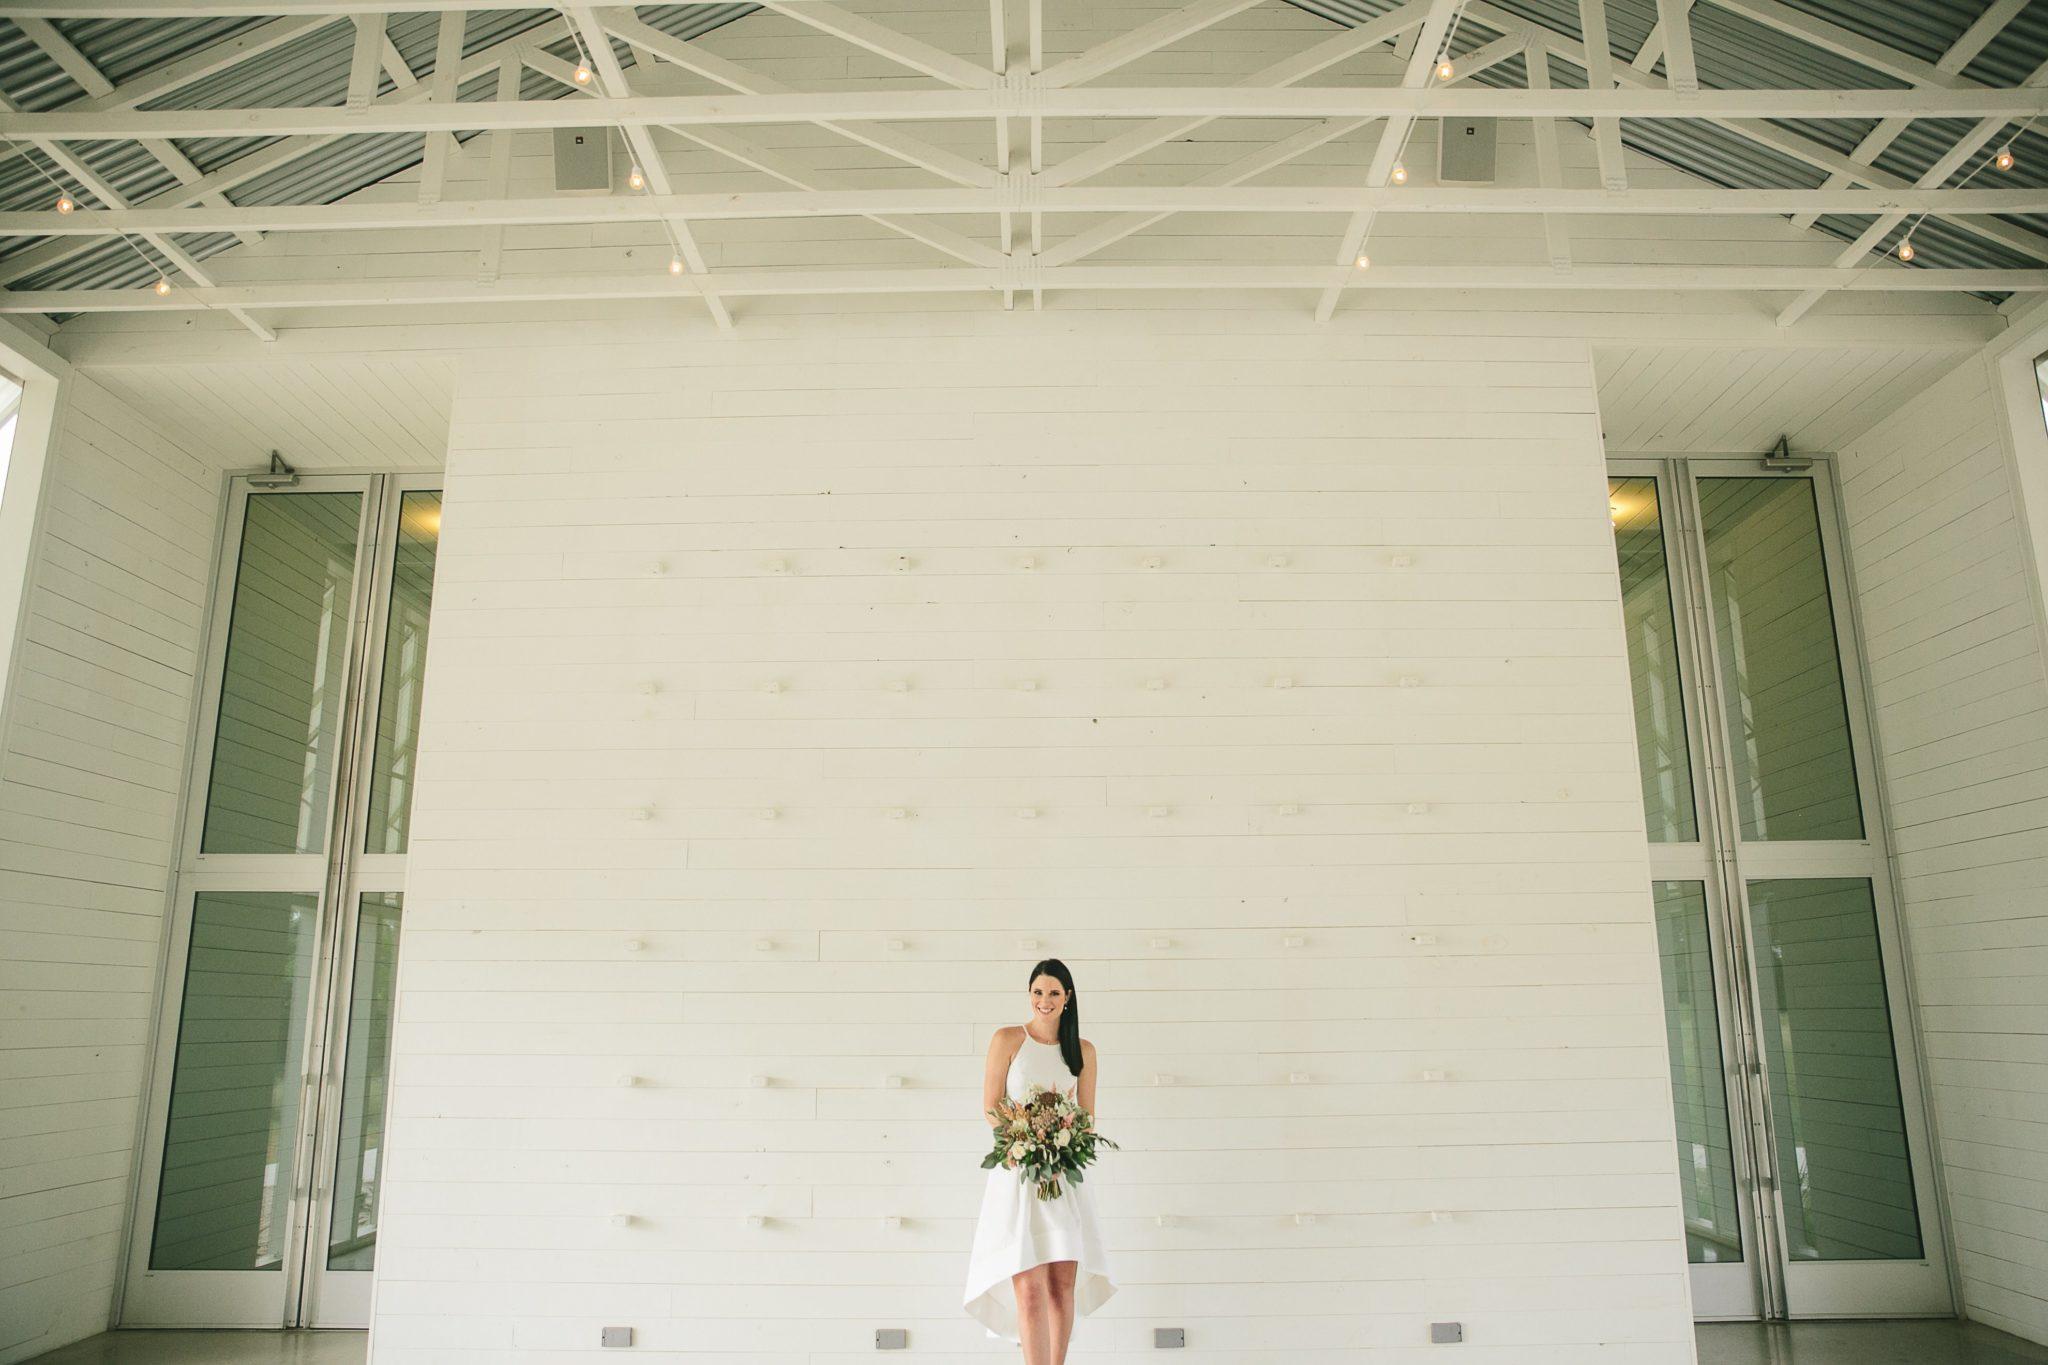 prospect-house-wedding-venue